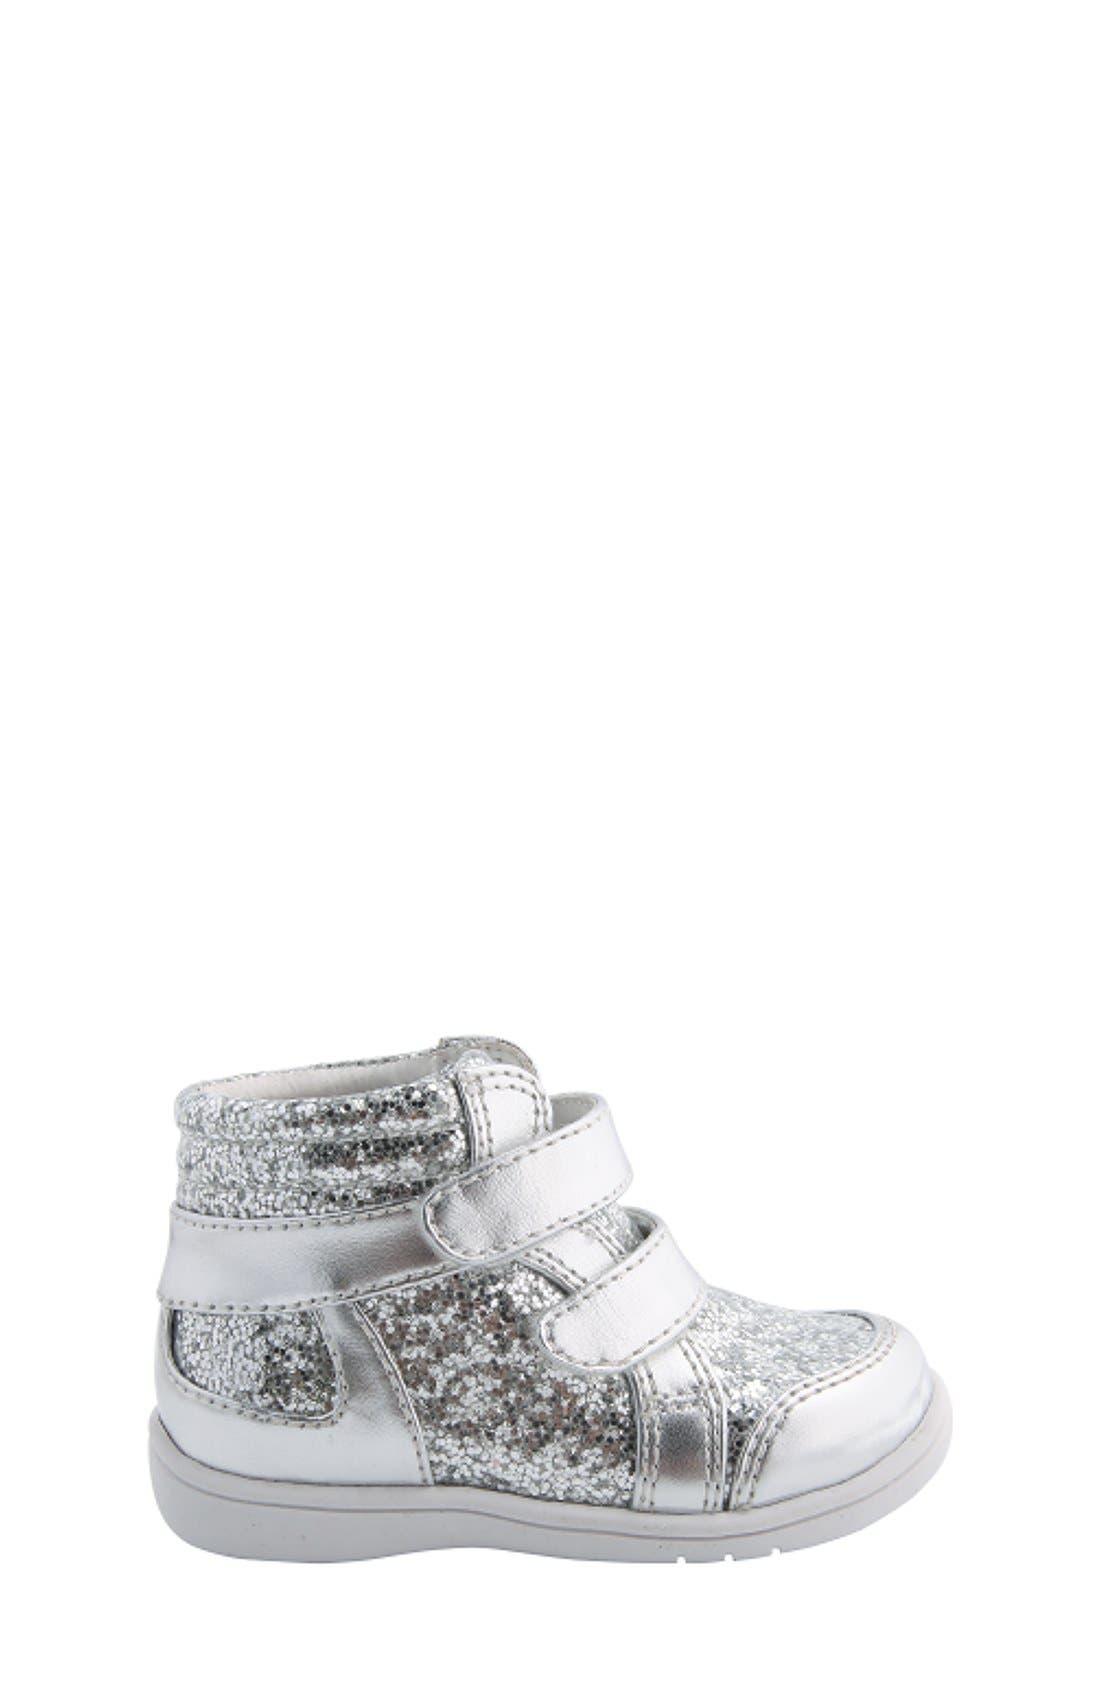 Nina 'Stardust' Metallic High Top Sneaker,                             Alternate thumbnail 6, color,                             Silver Metallic